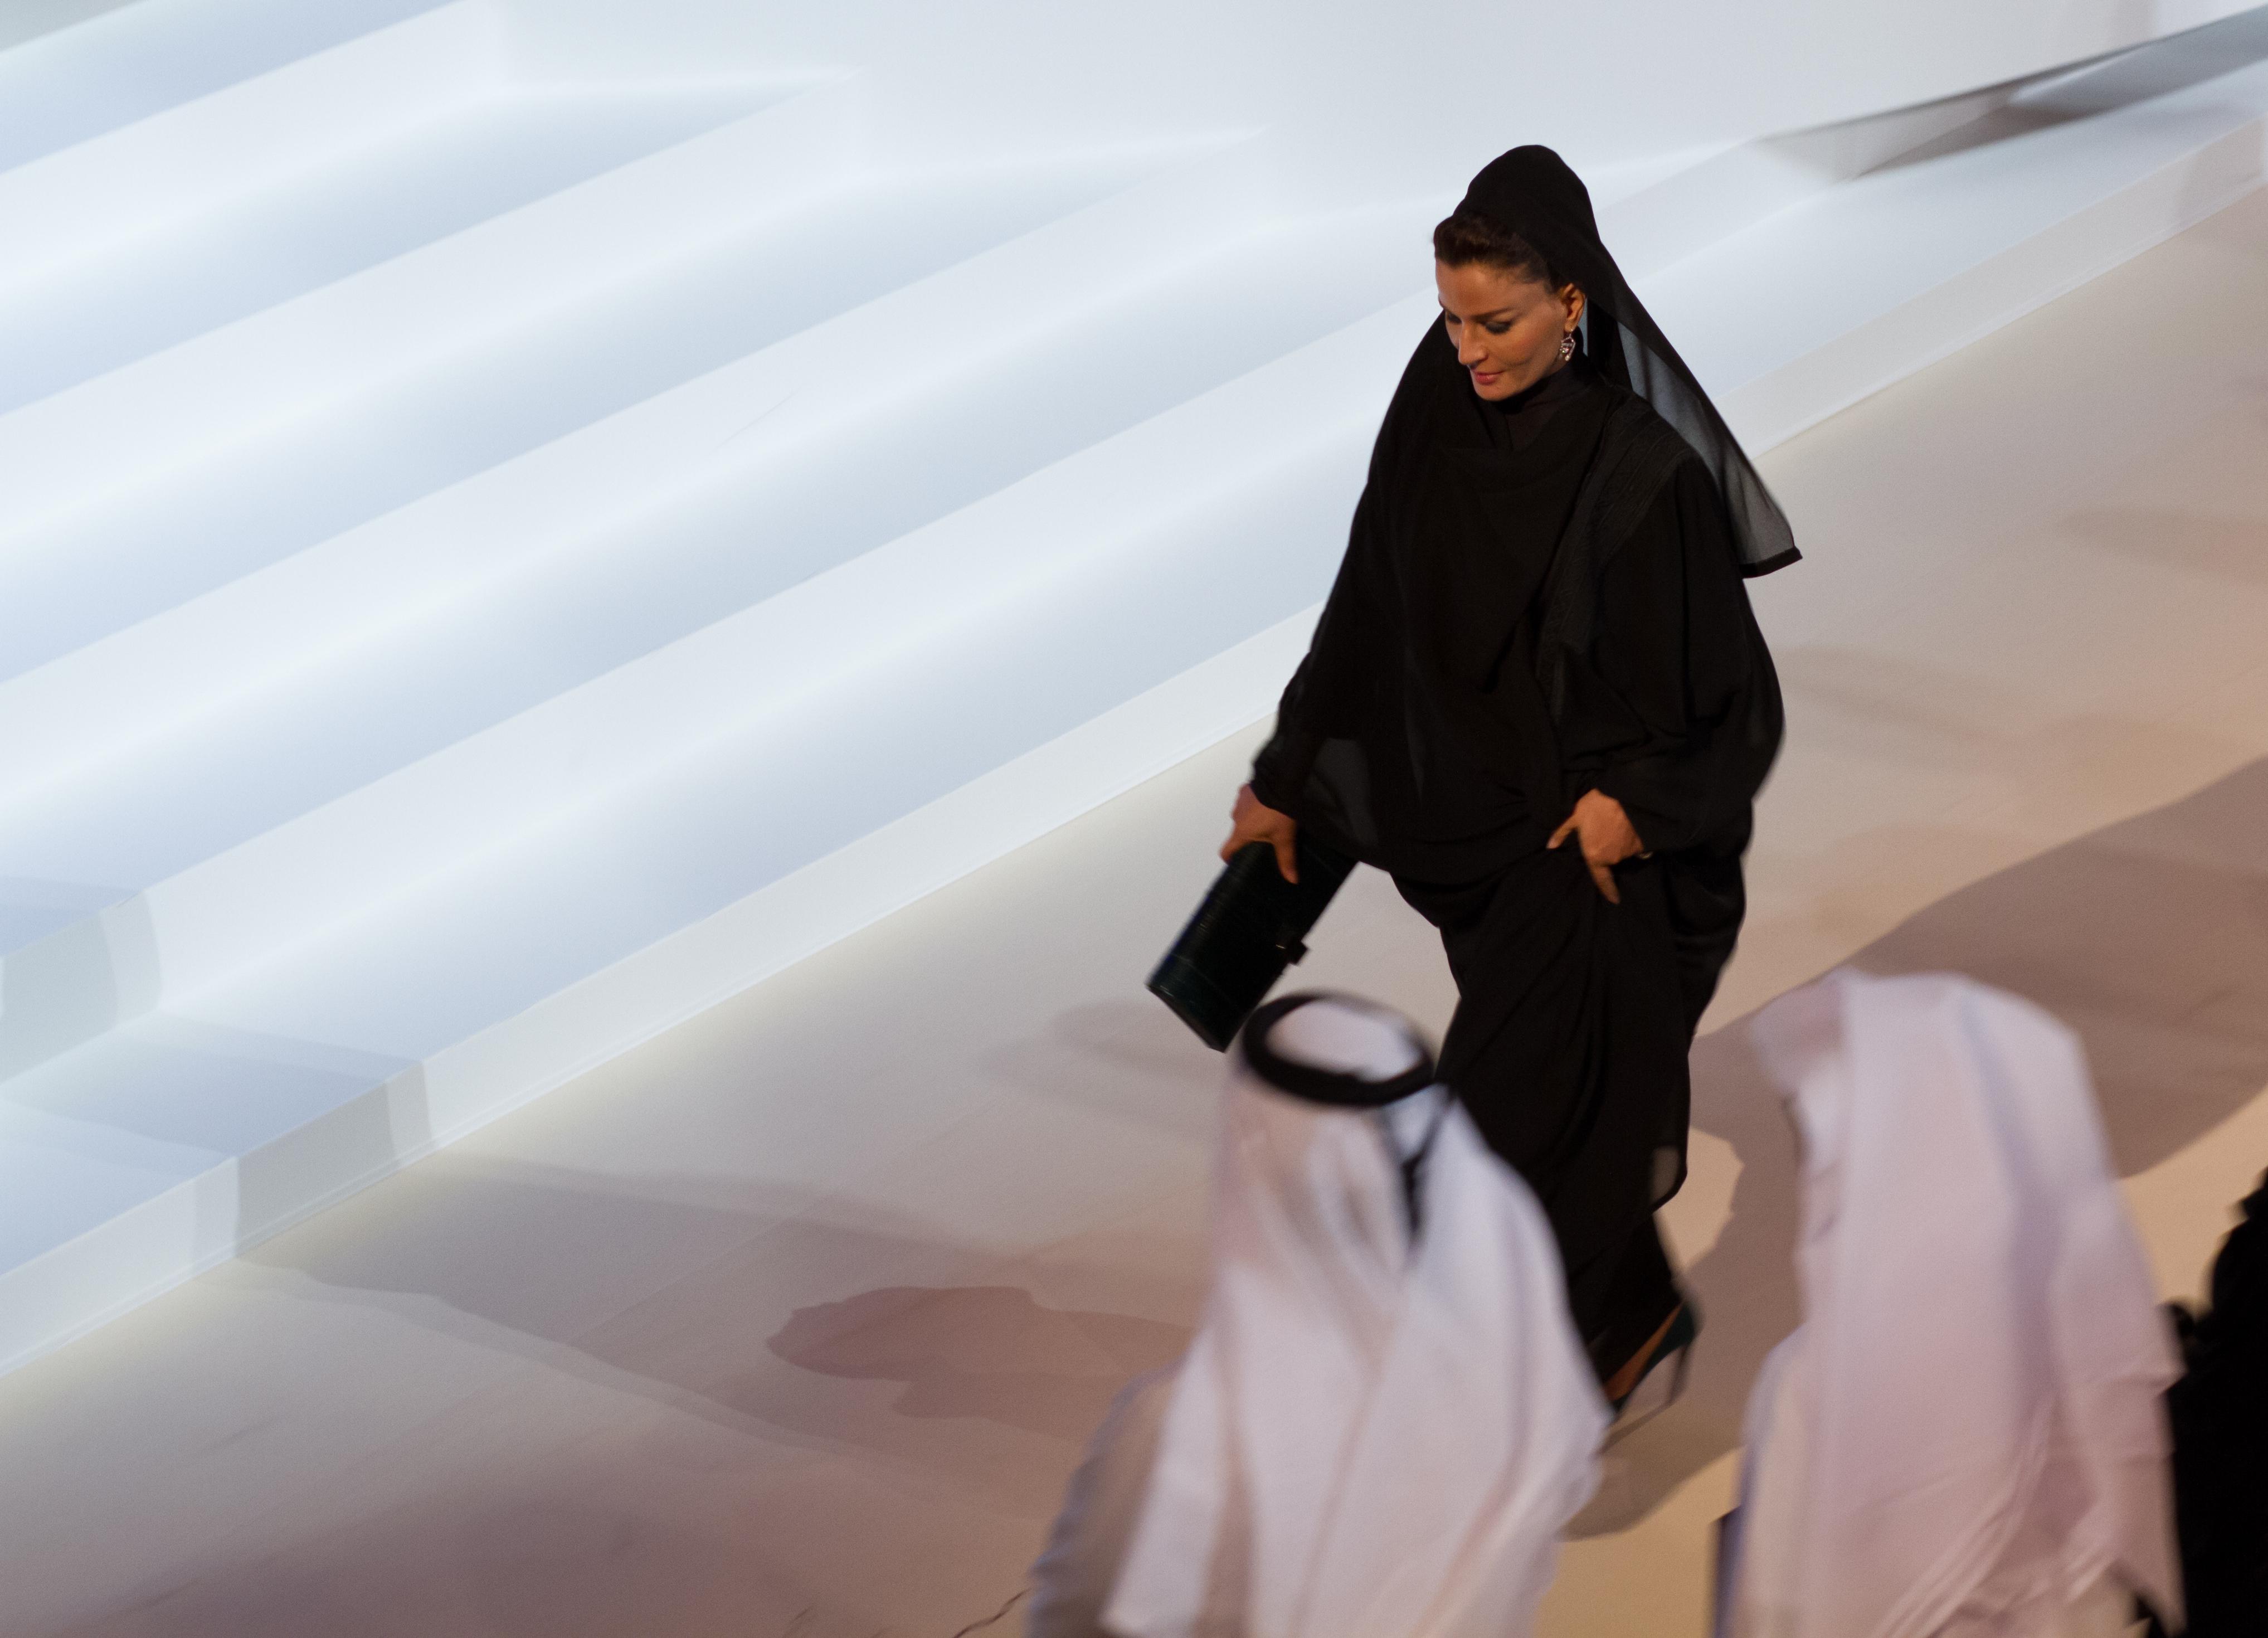 Sheikha Qatar